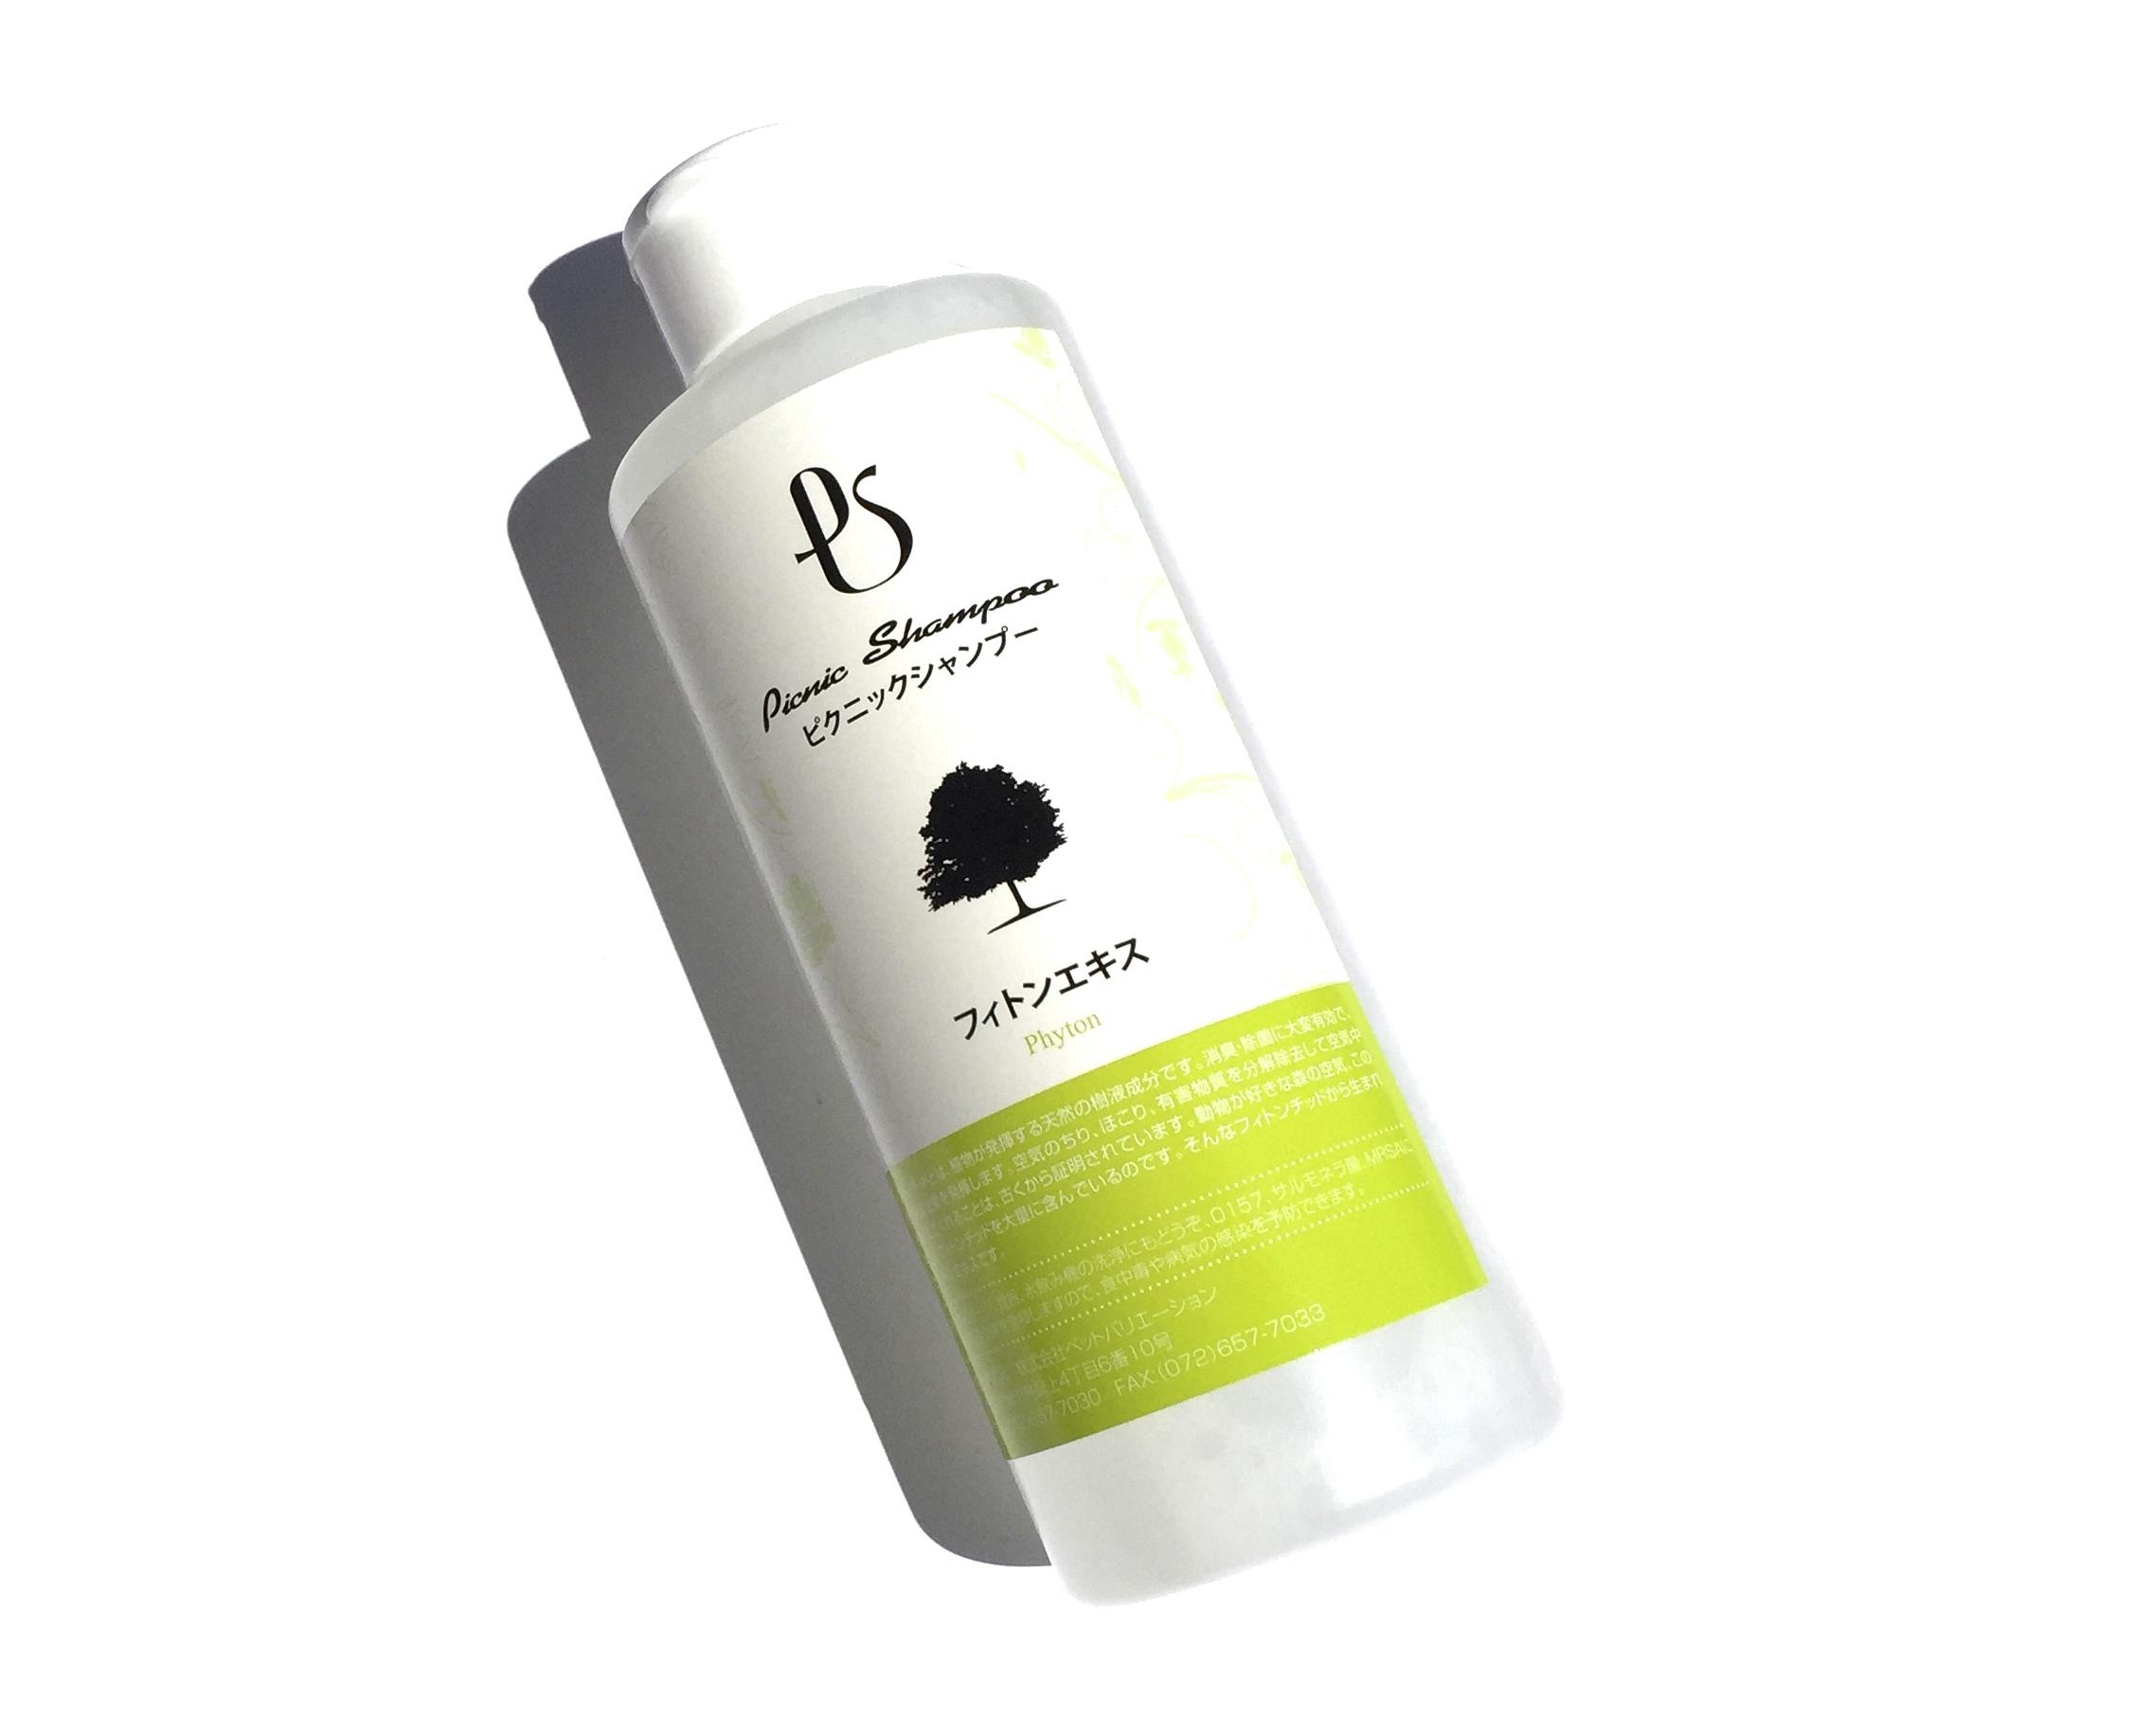 Picnic Shampoo  PHyton Extract ピクニック シャンプーフィトン エキス_d0217958_1134269.jpg